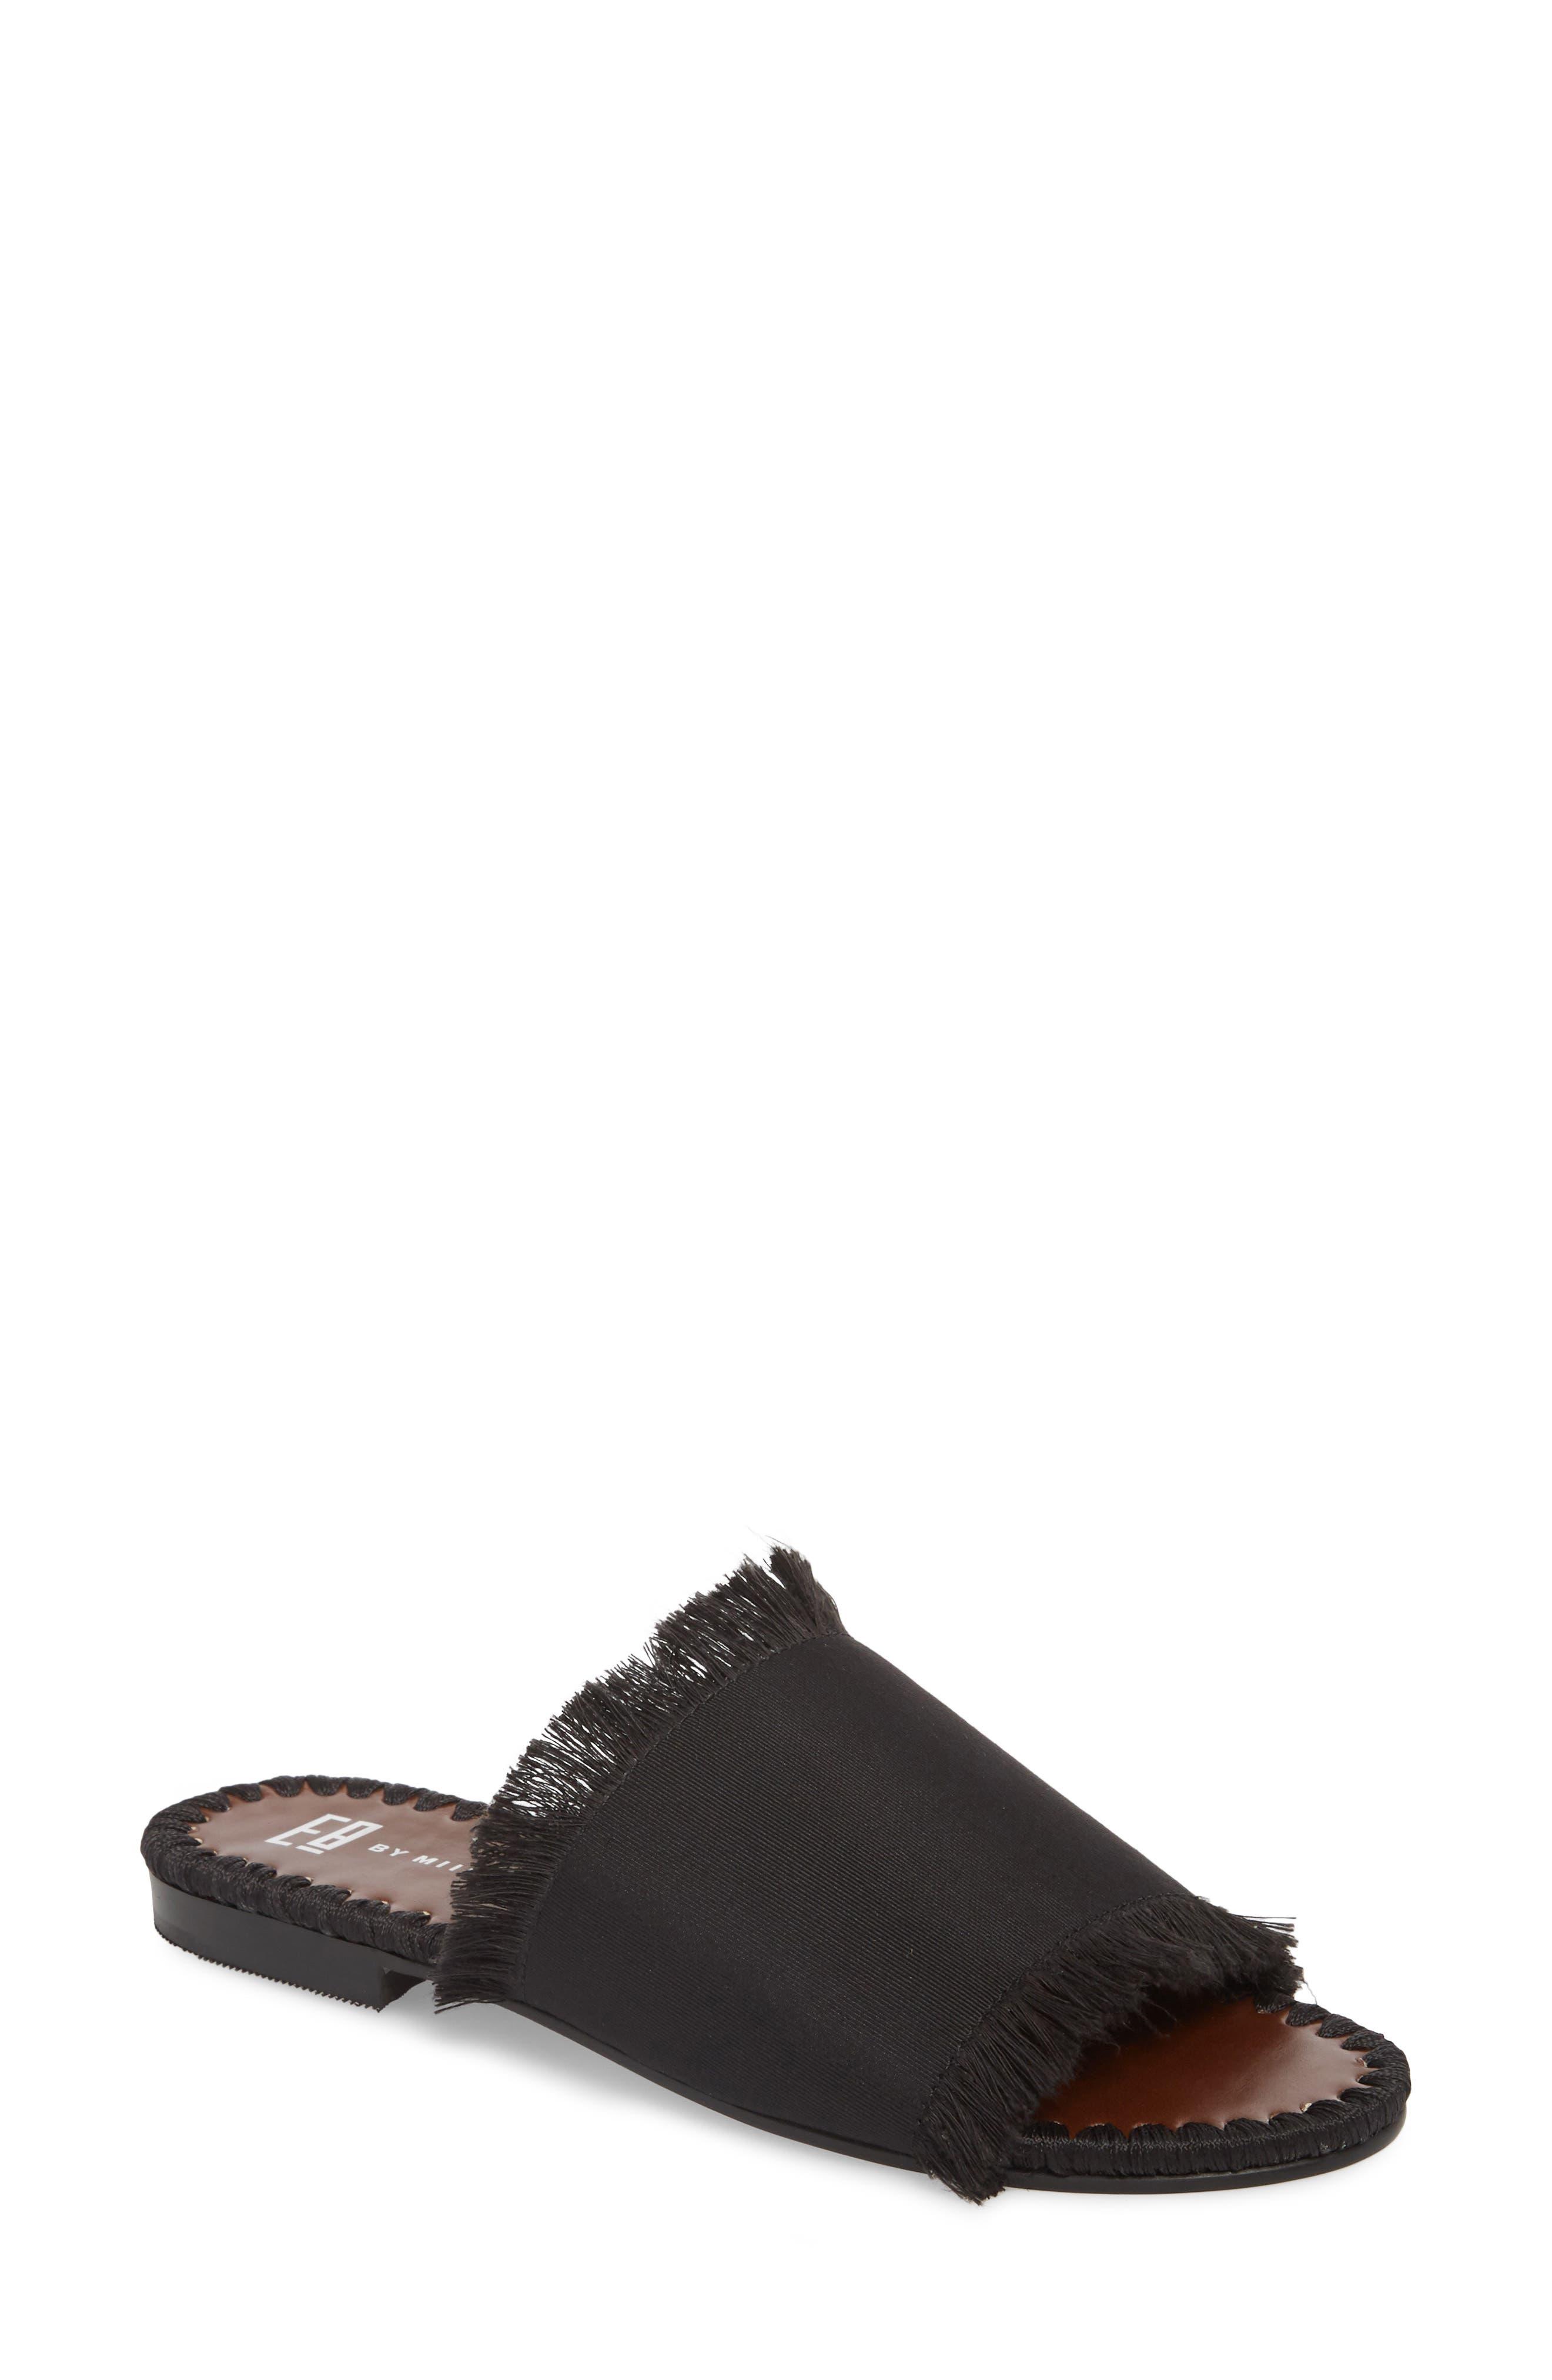 Tavie Fringed Slide Sandal,                         Main,                         color, BLACK FABRIC